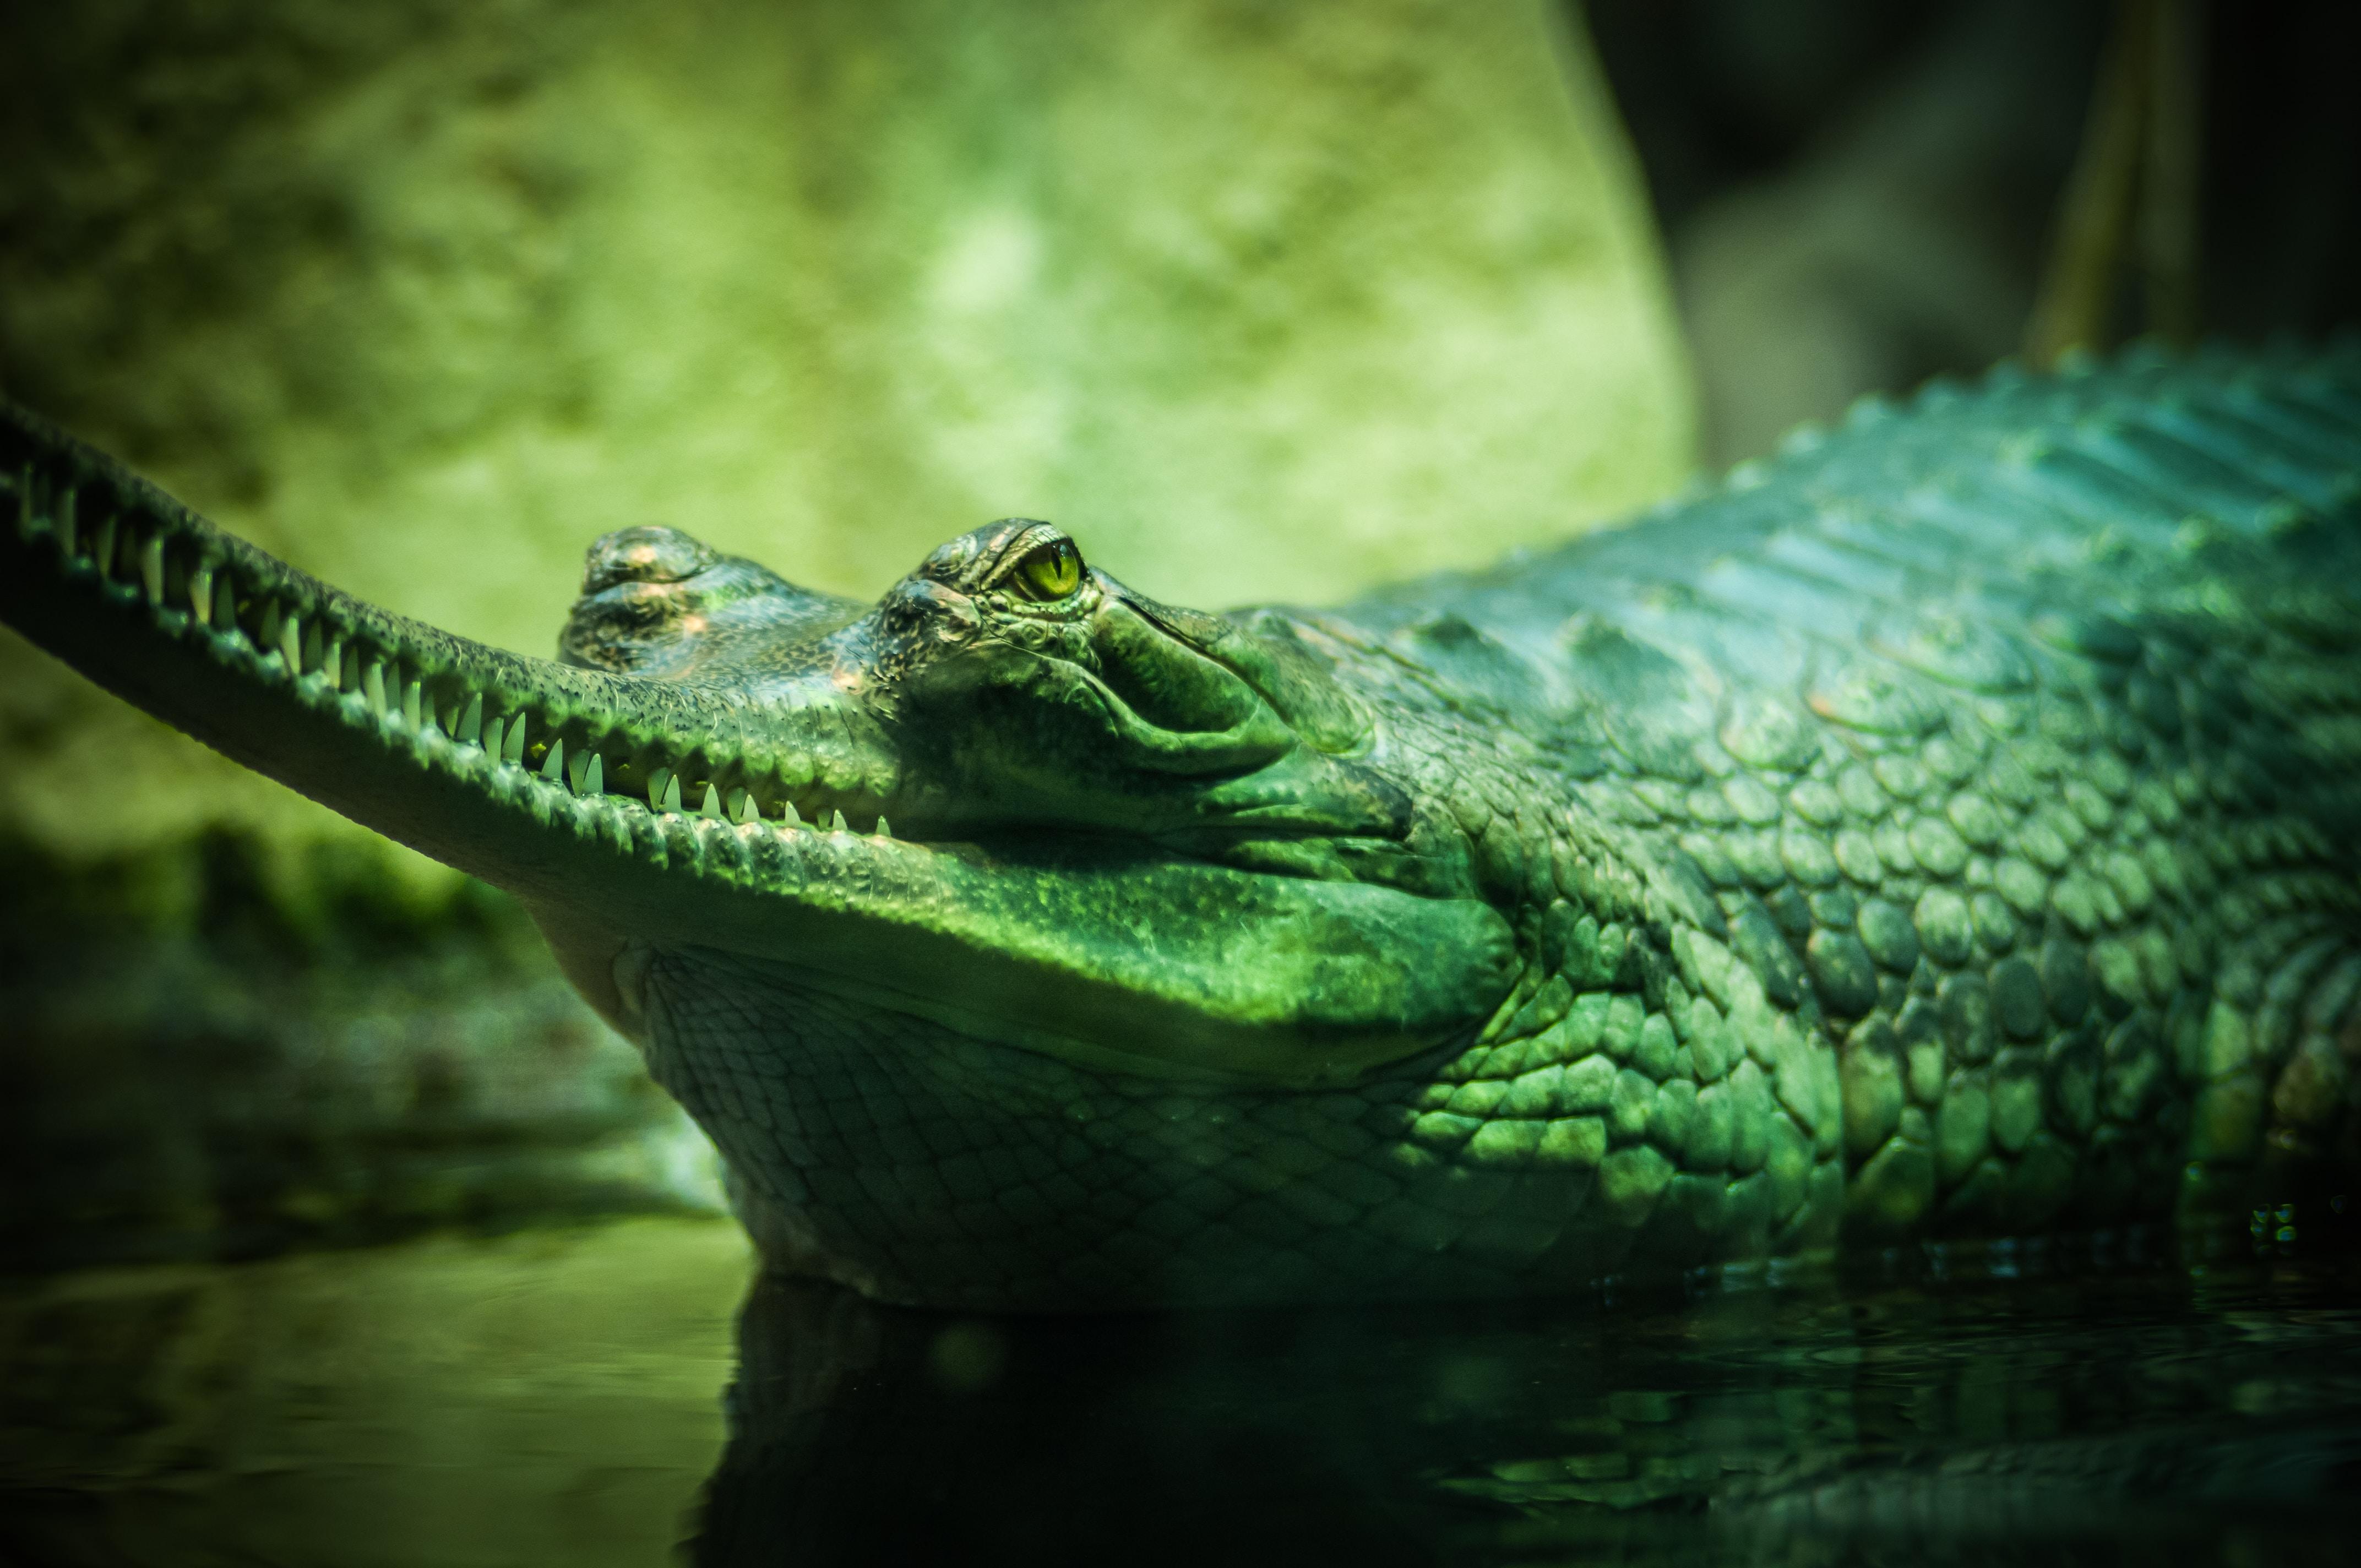 Green crocodile beside a giant rock